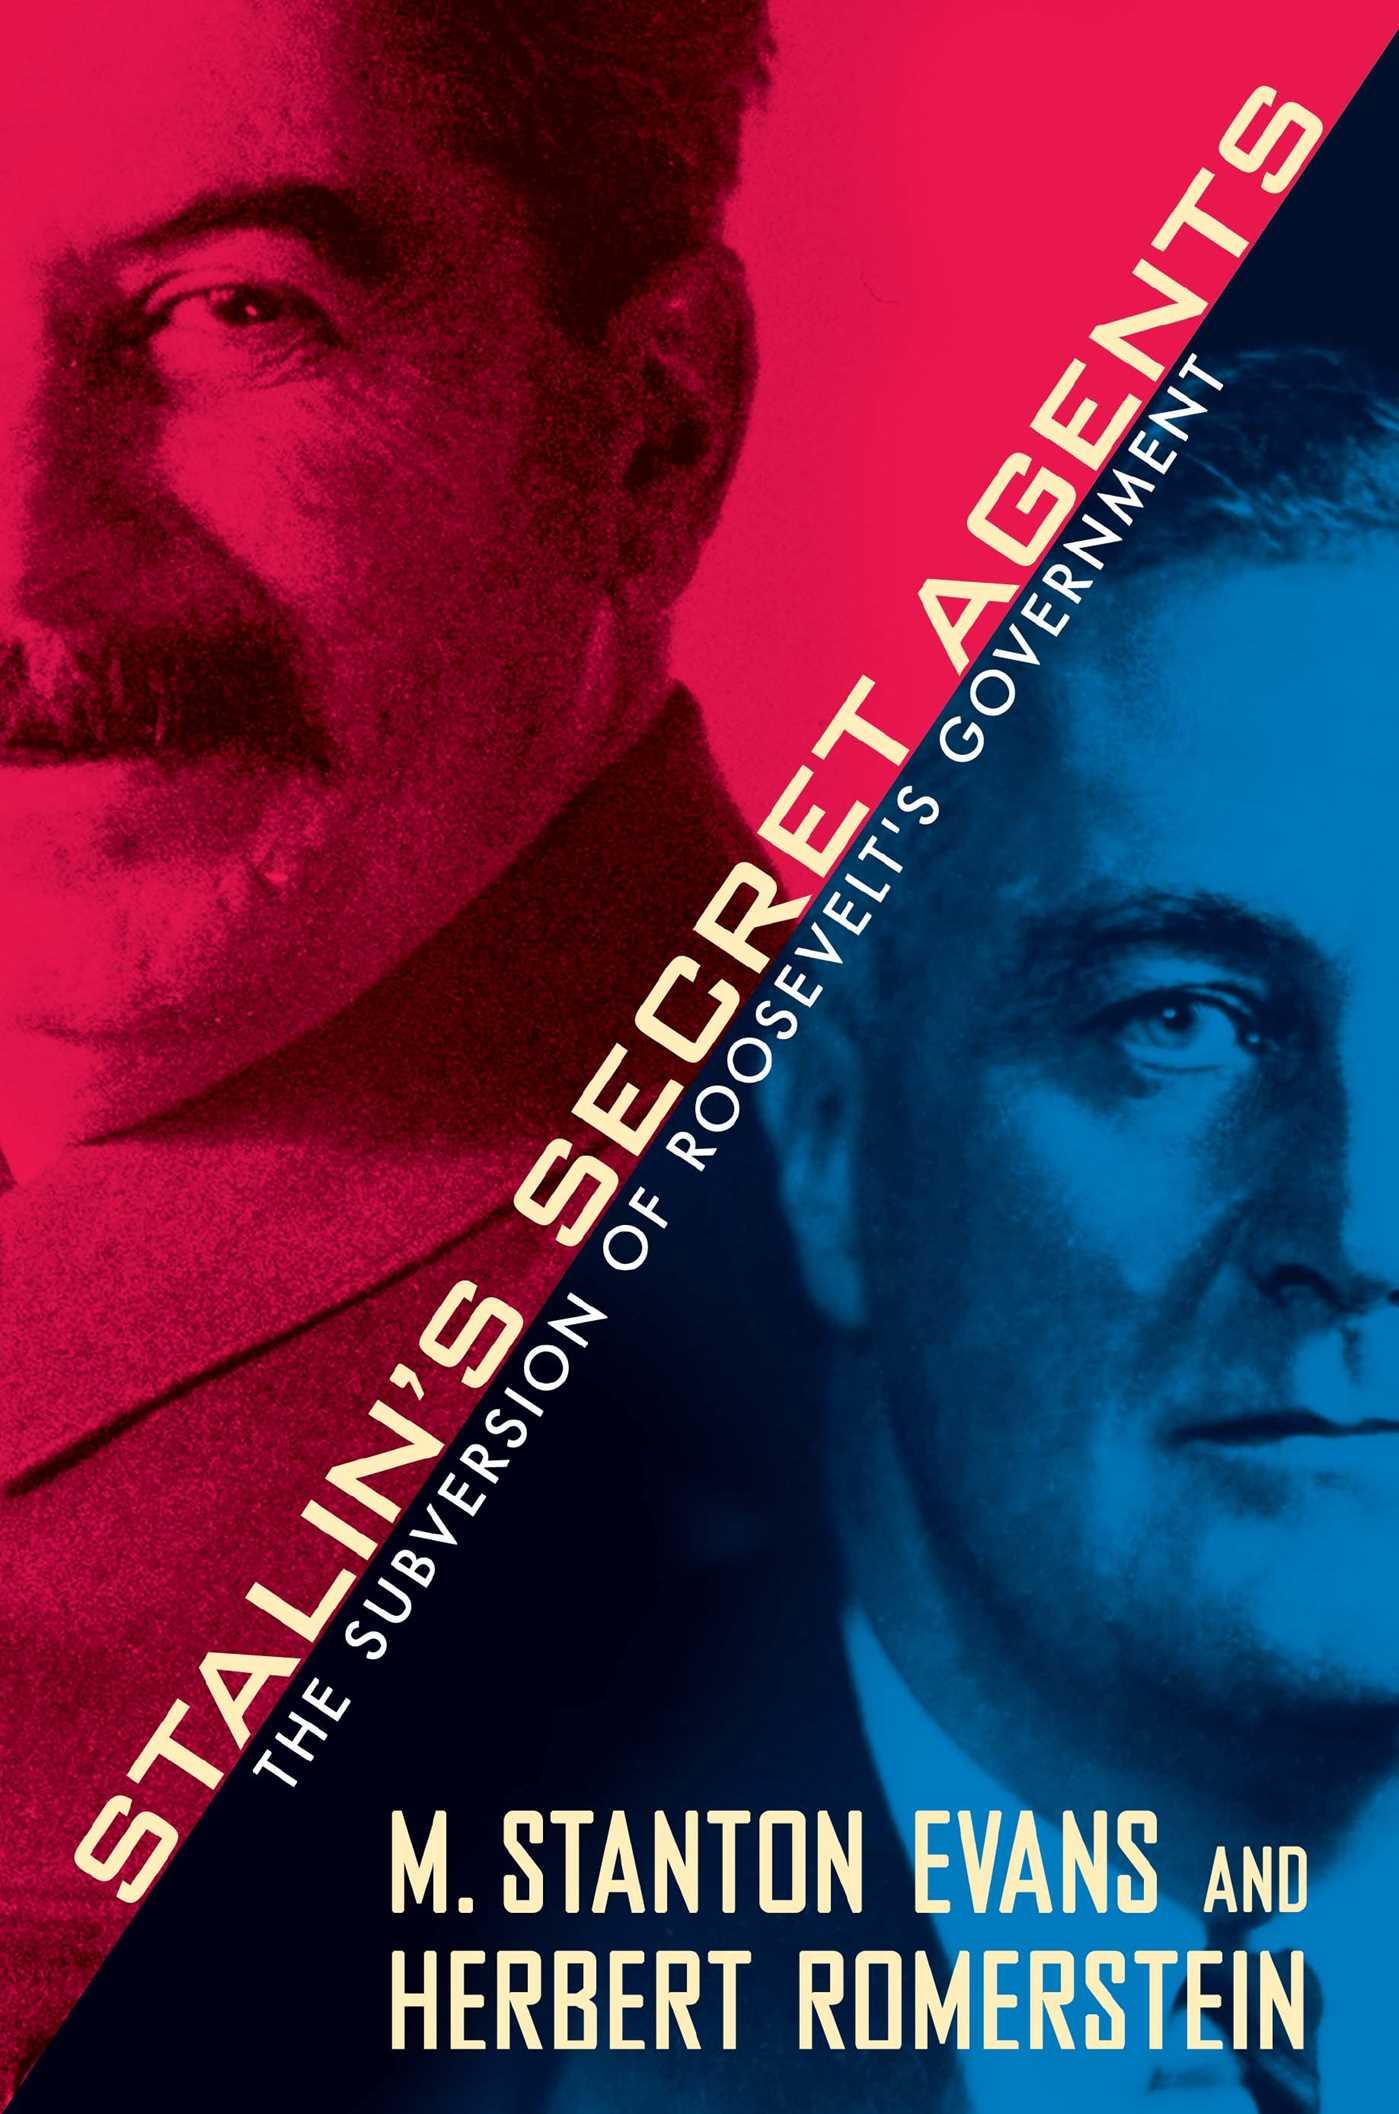 Stalins secret agents 9781439147702 hr